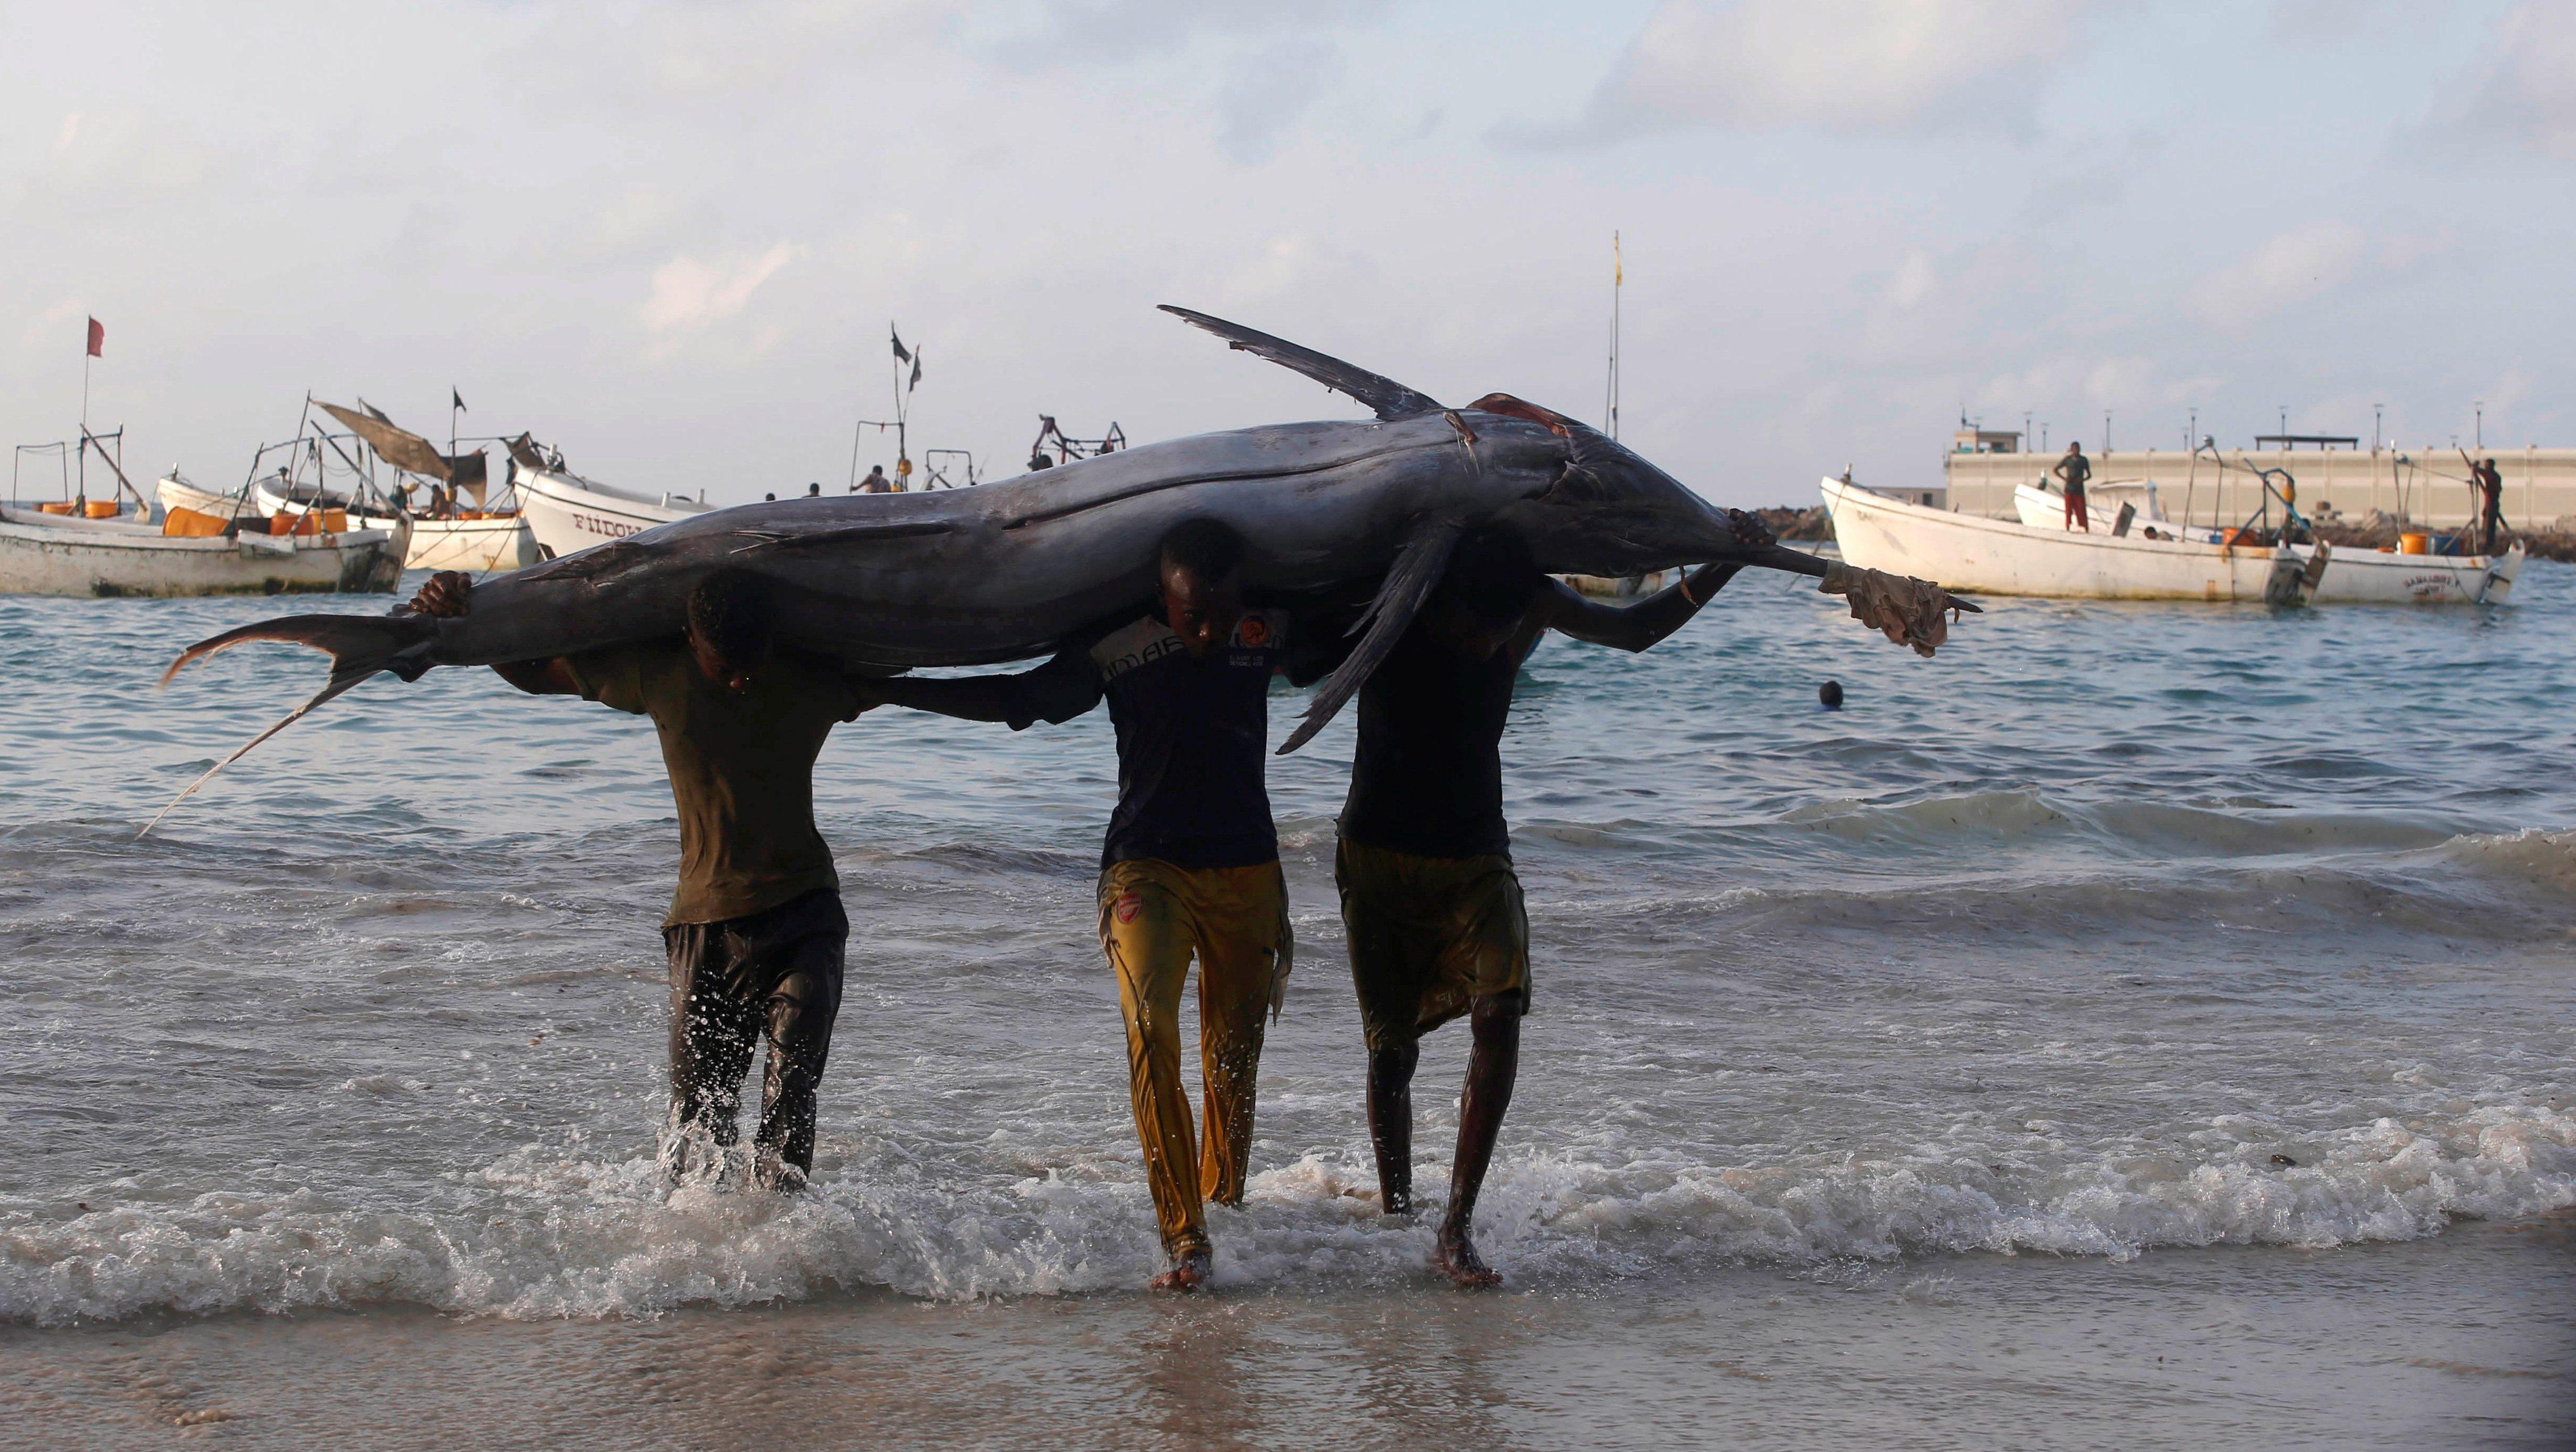 Somalia gives fishing license to 31 China vessels — Quartz Africa